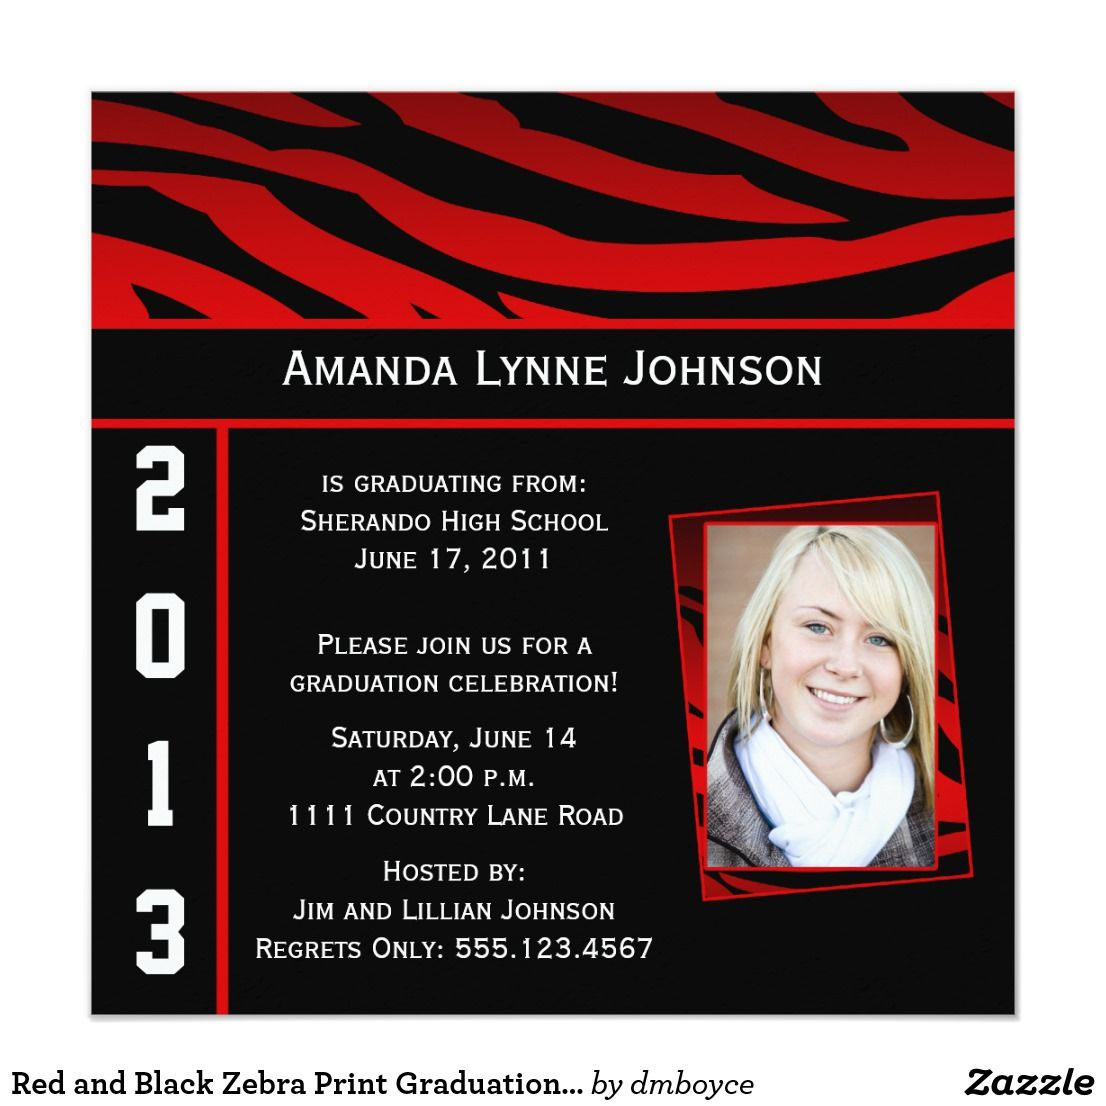 Red and Black Zebra Print Graduation Invitation | { Products I ...